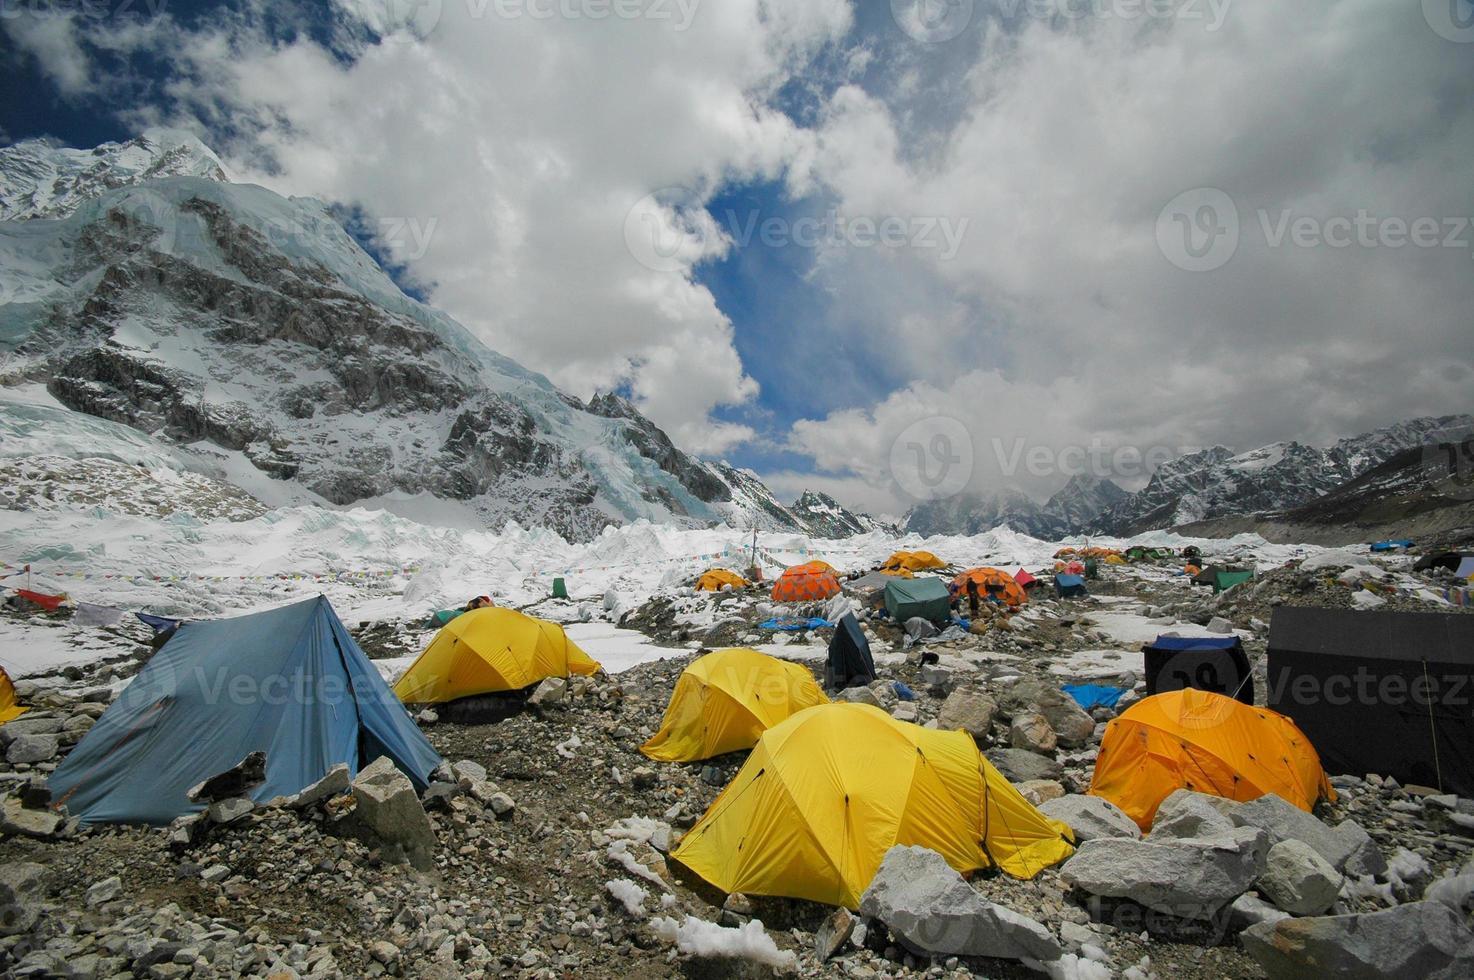 tende nel campo base dell'Everest. Nepal Himalaya. foto